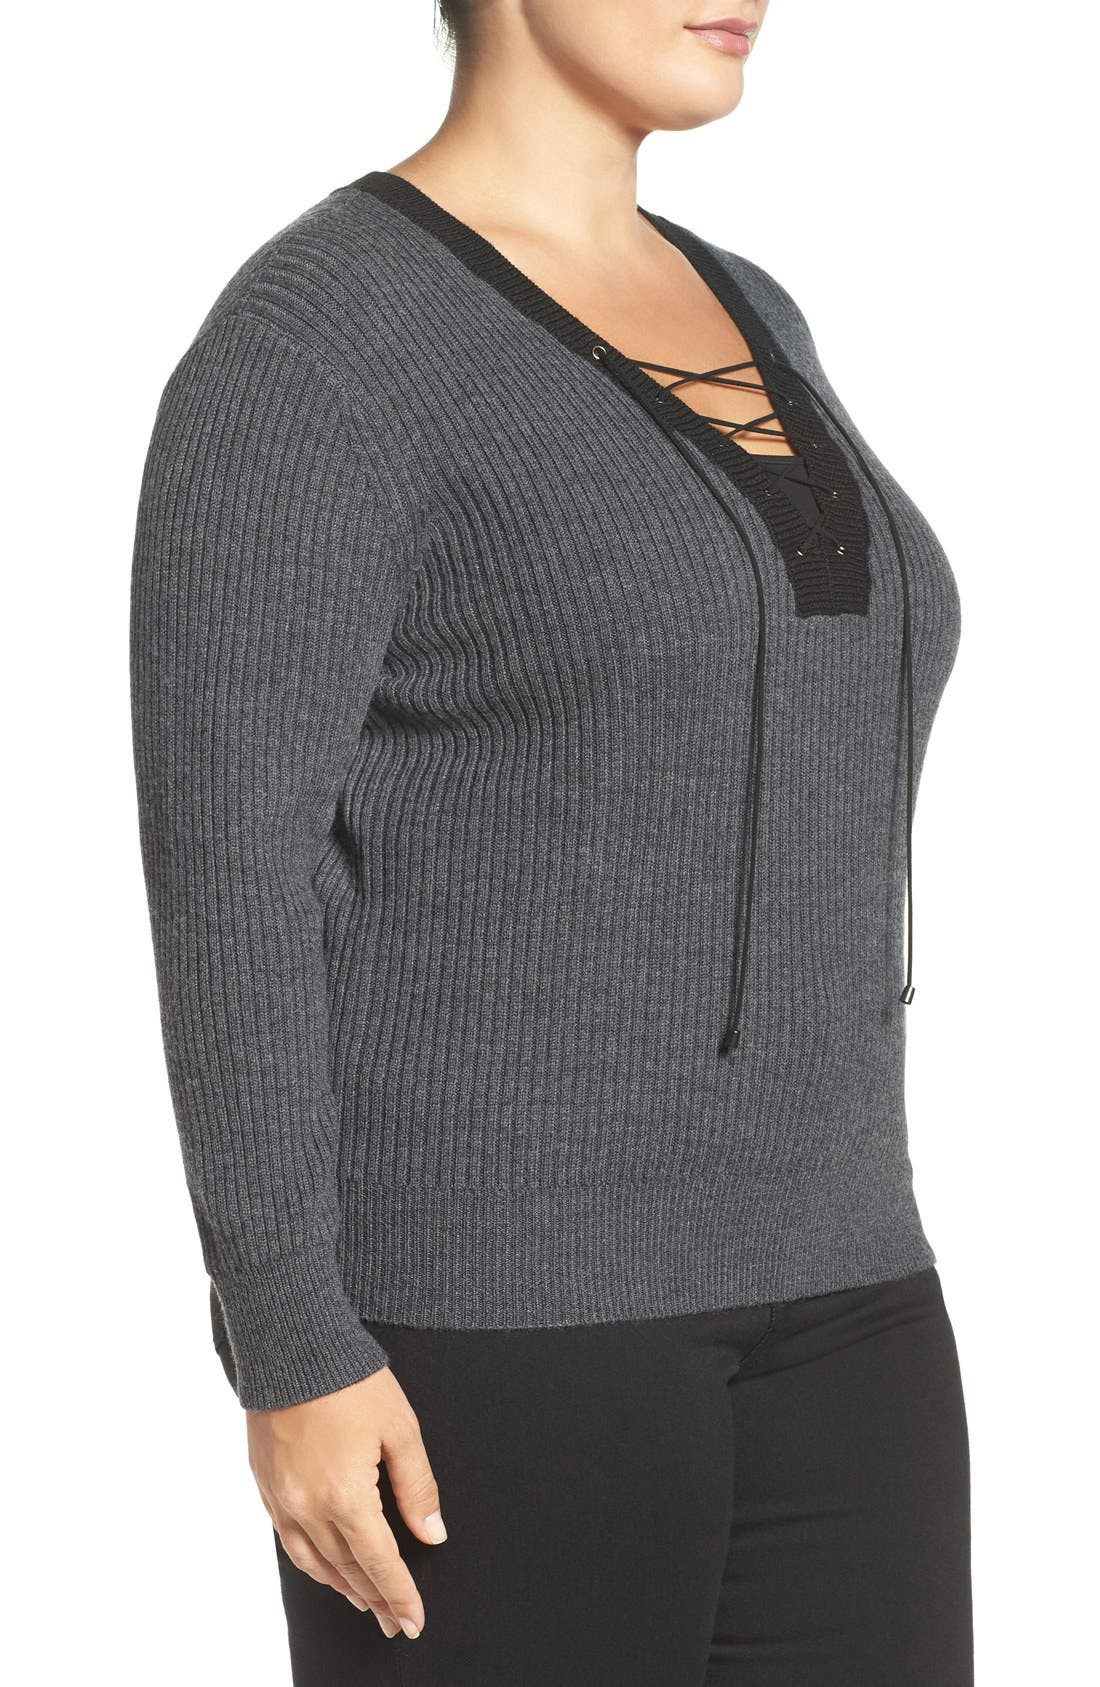 Alternate Image 3  - Tart Amity Lace-Up Merino Sweater (Plus Size)